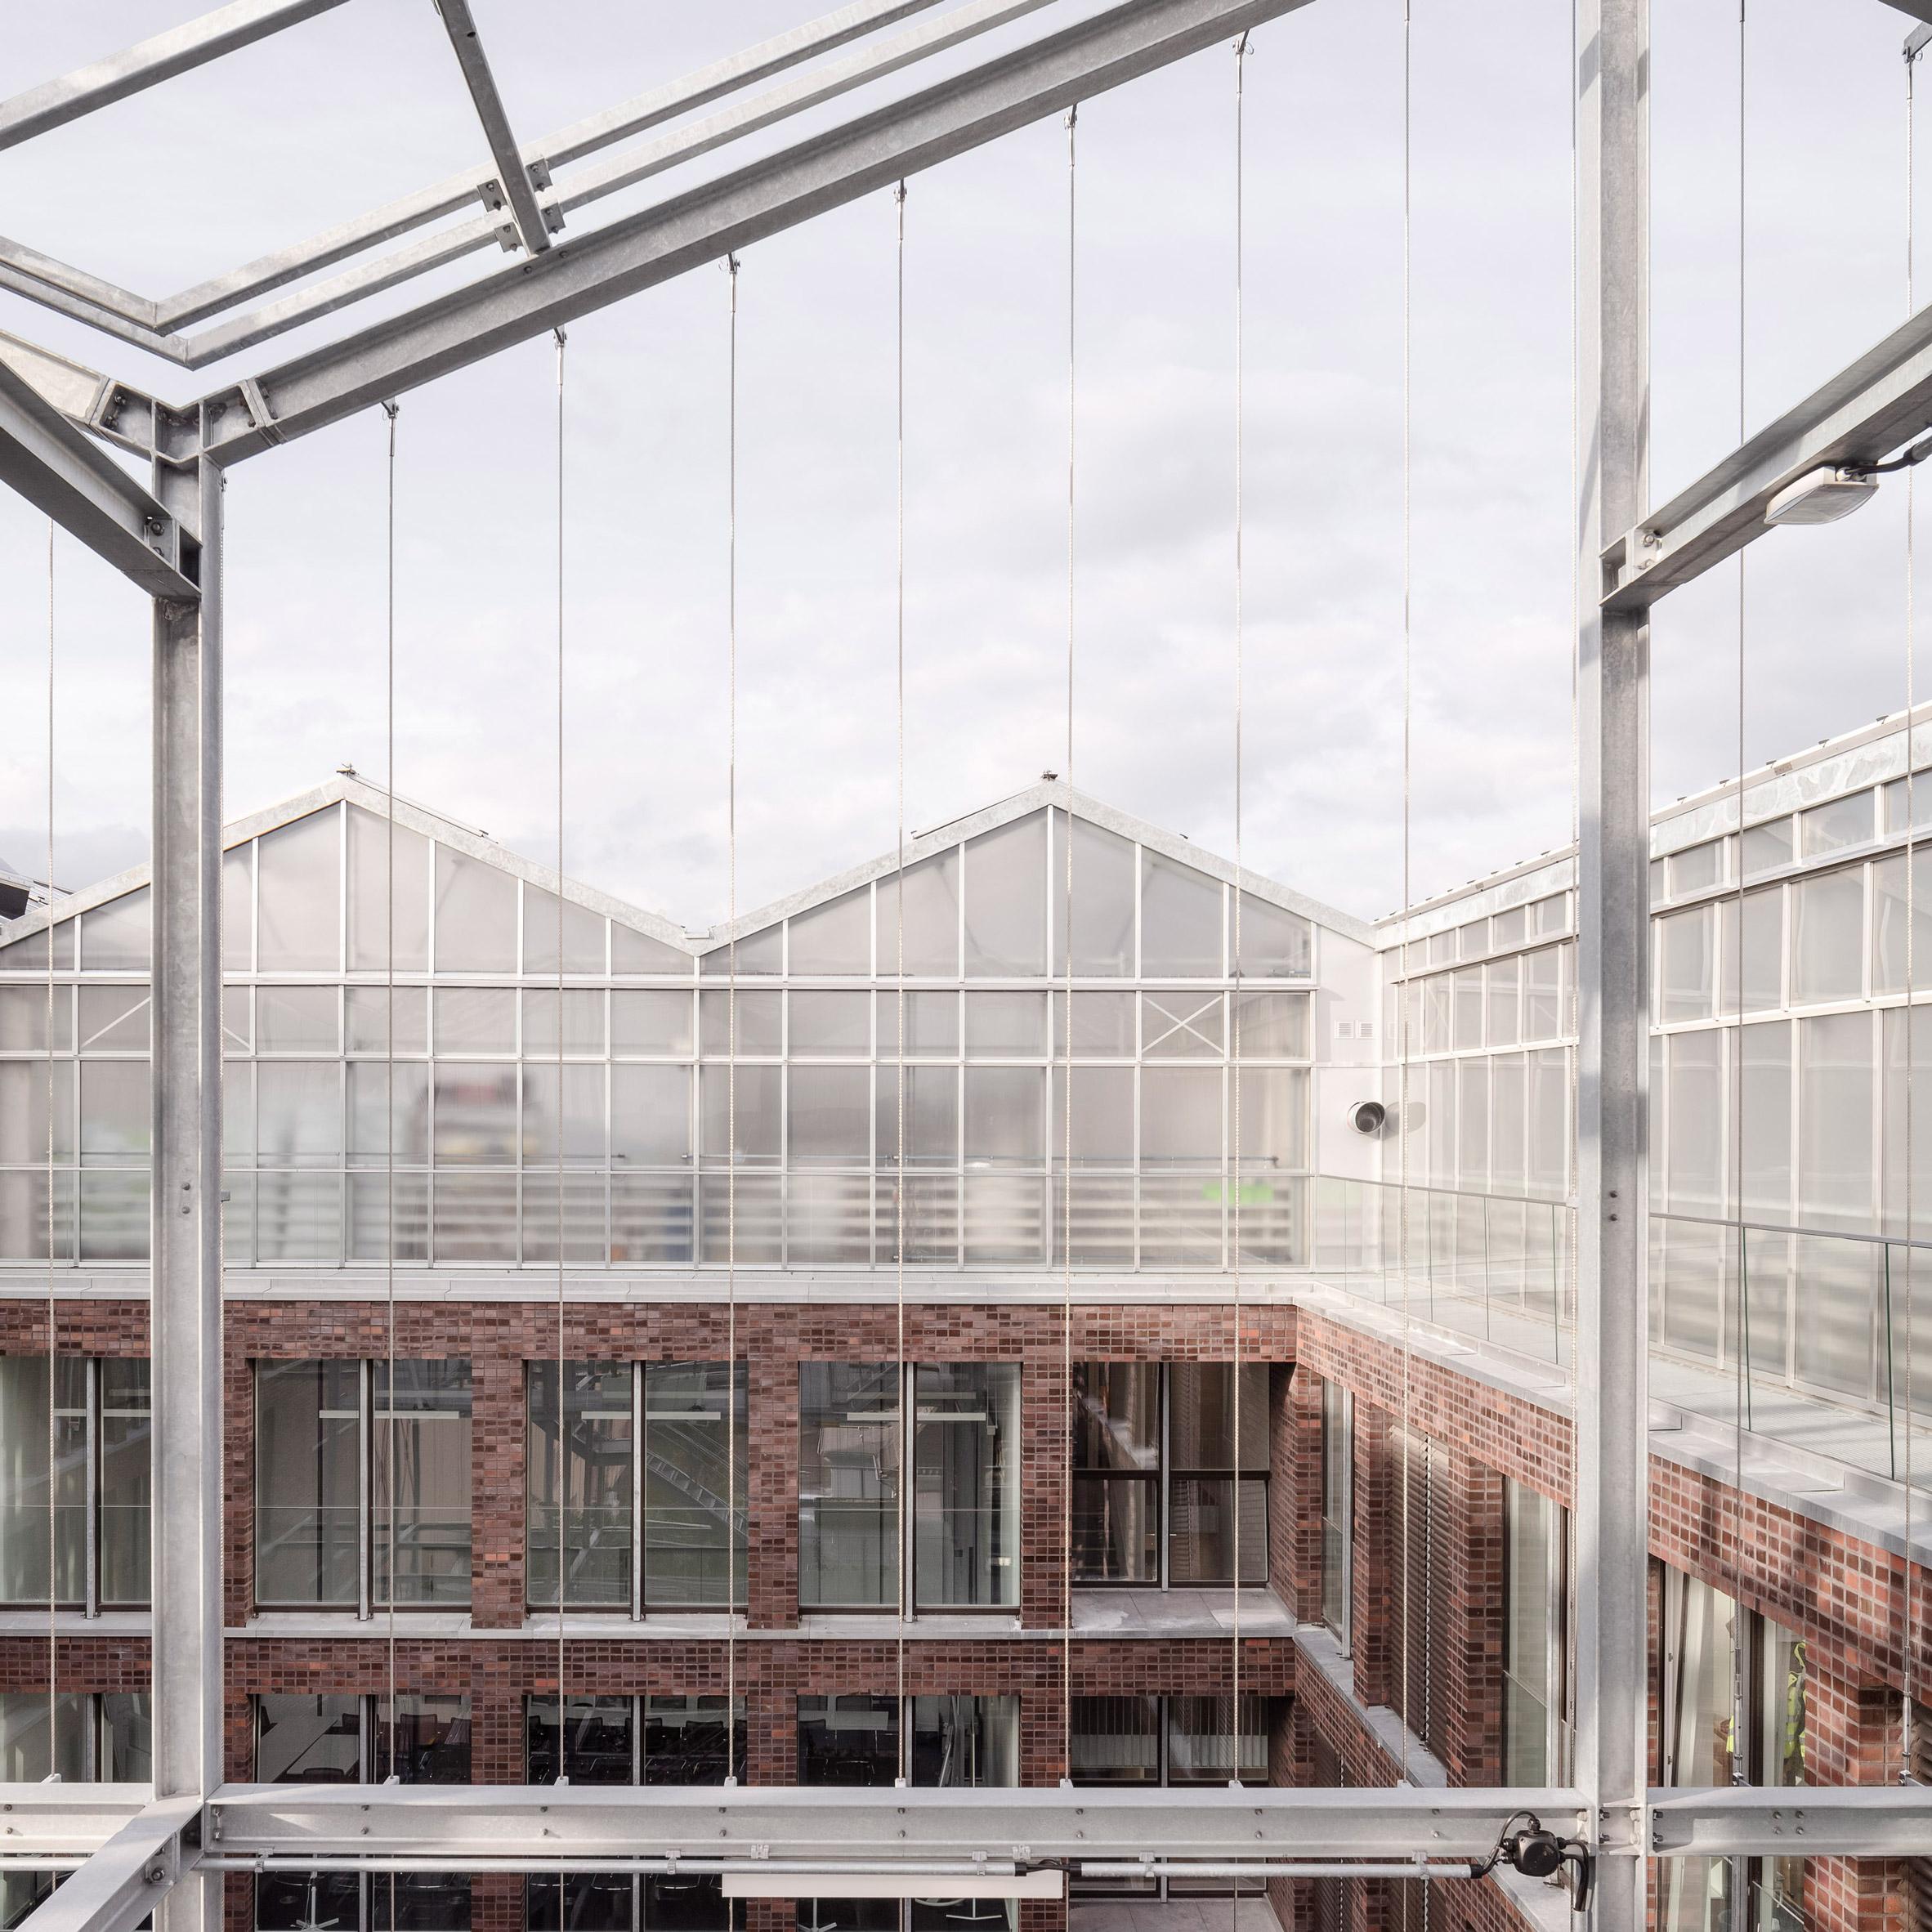 Kuehn Malvezzi Tops Brick Office With Translucent Urban Greenhouse